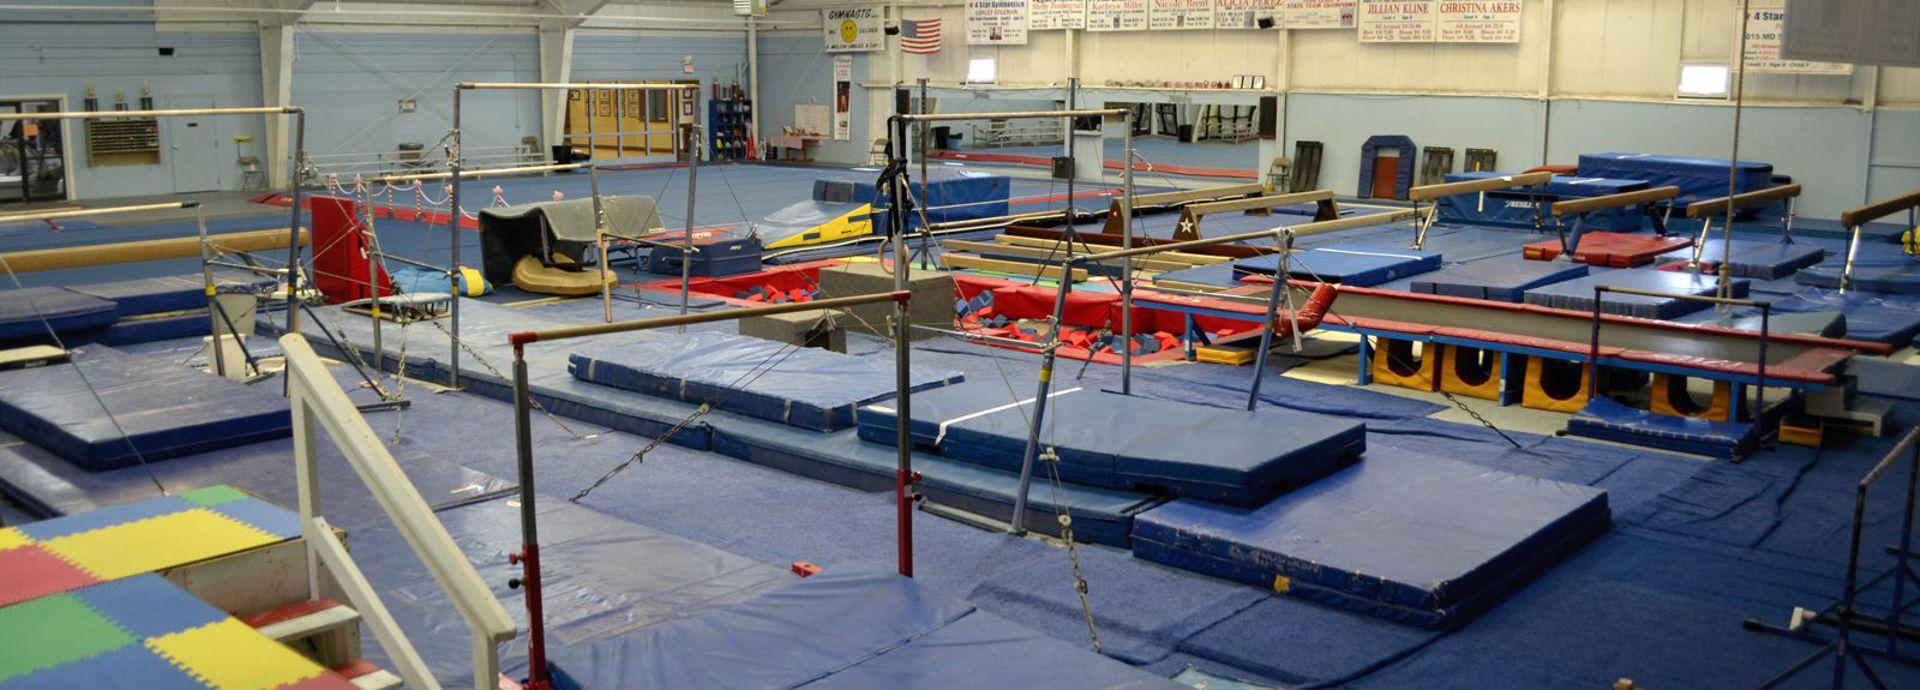 Rochester Gymnastics Academy